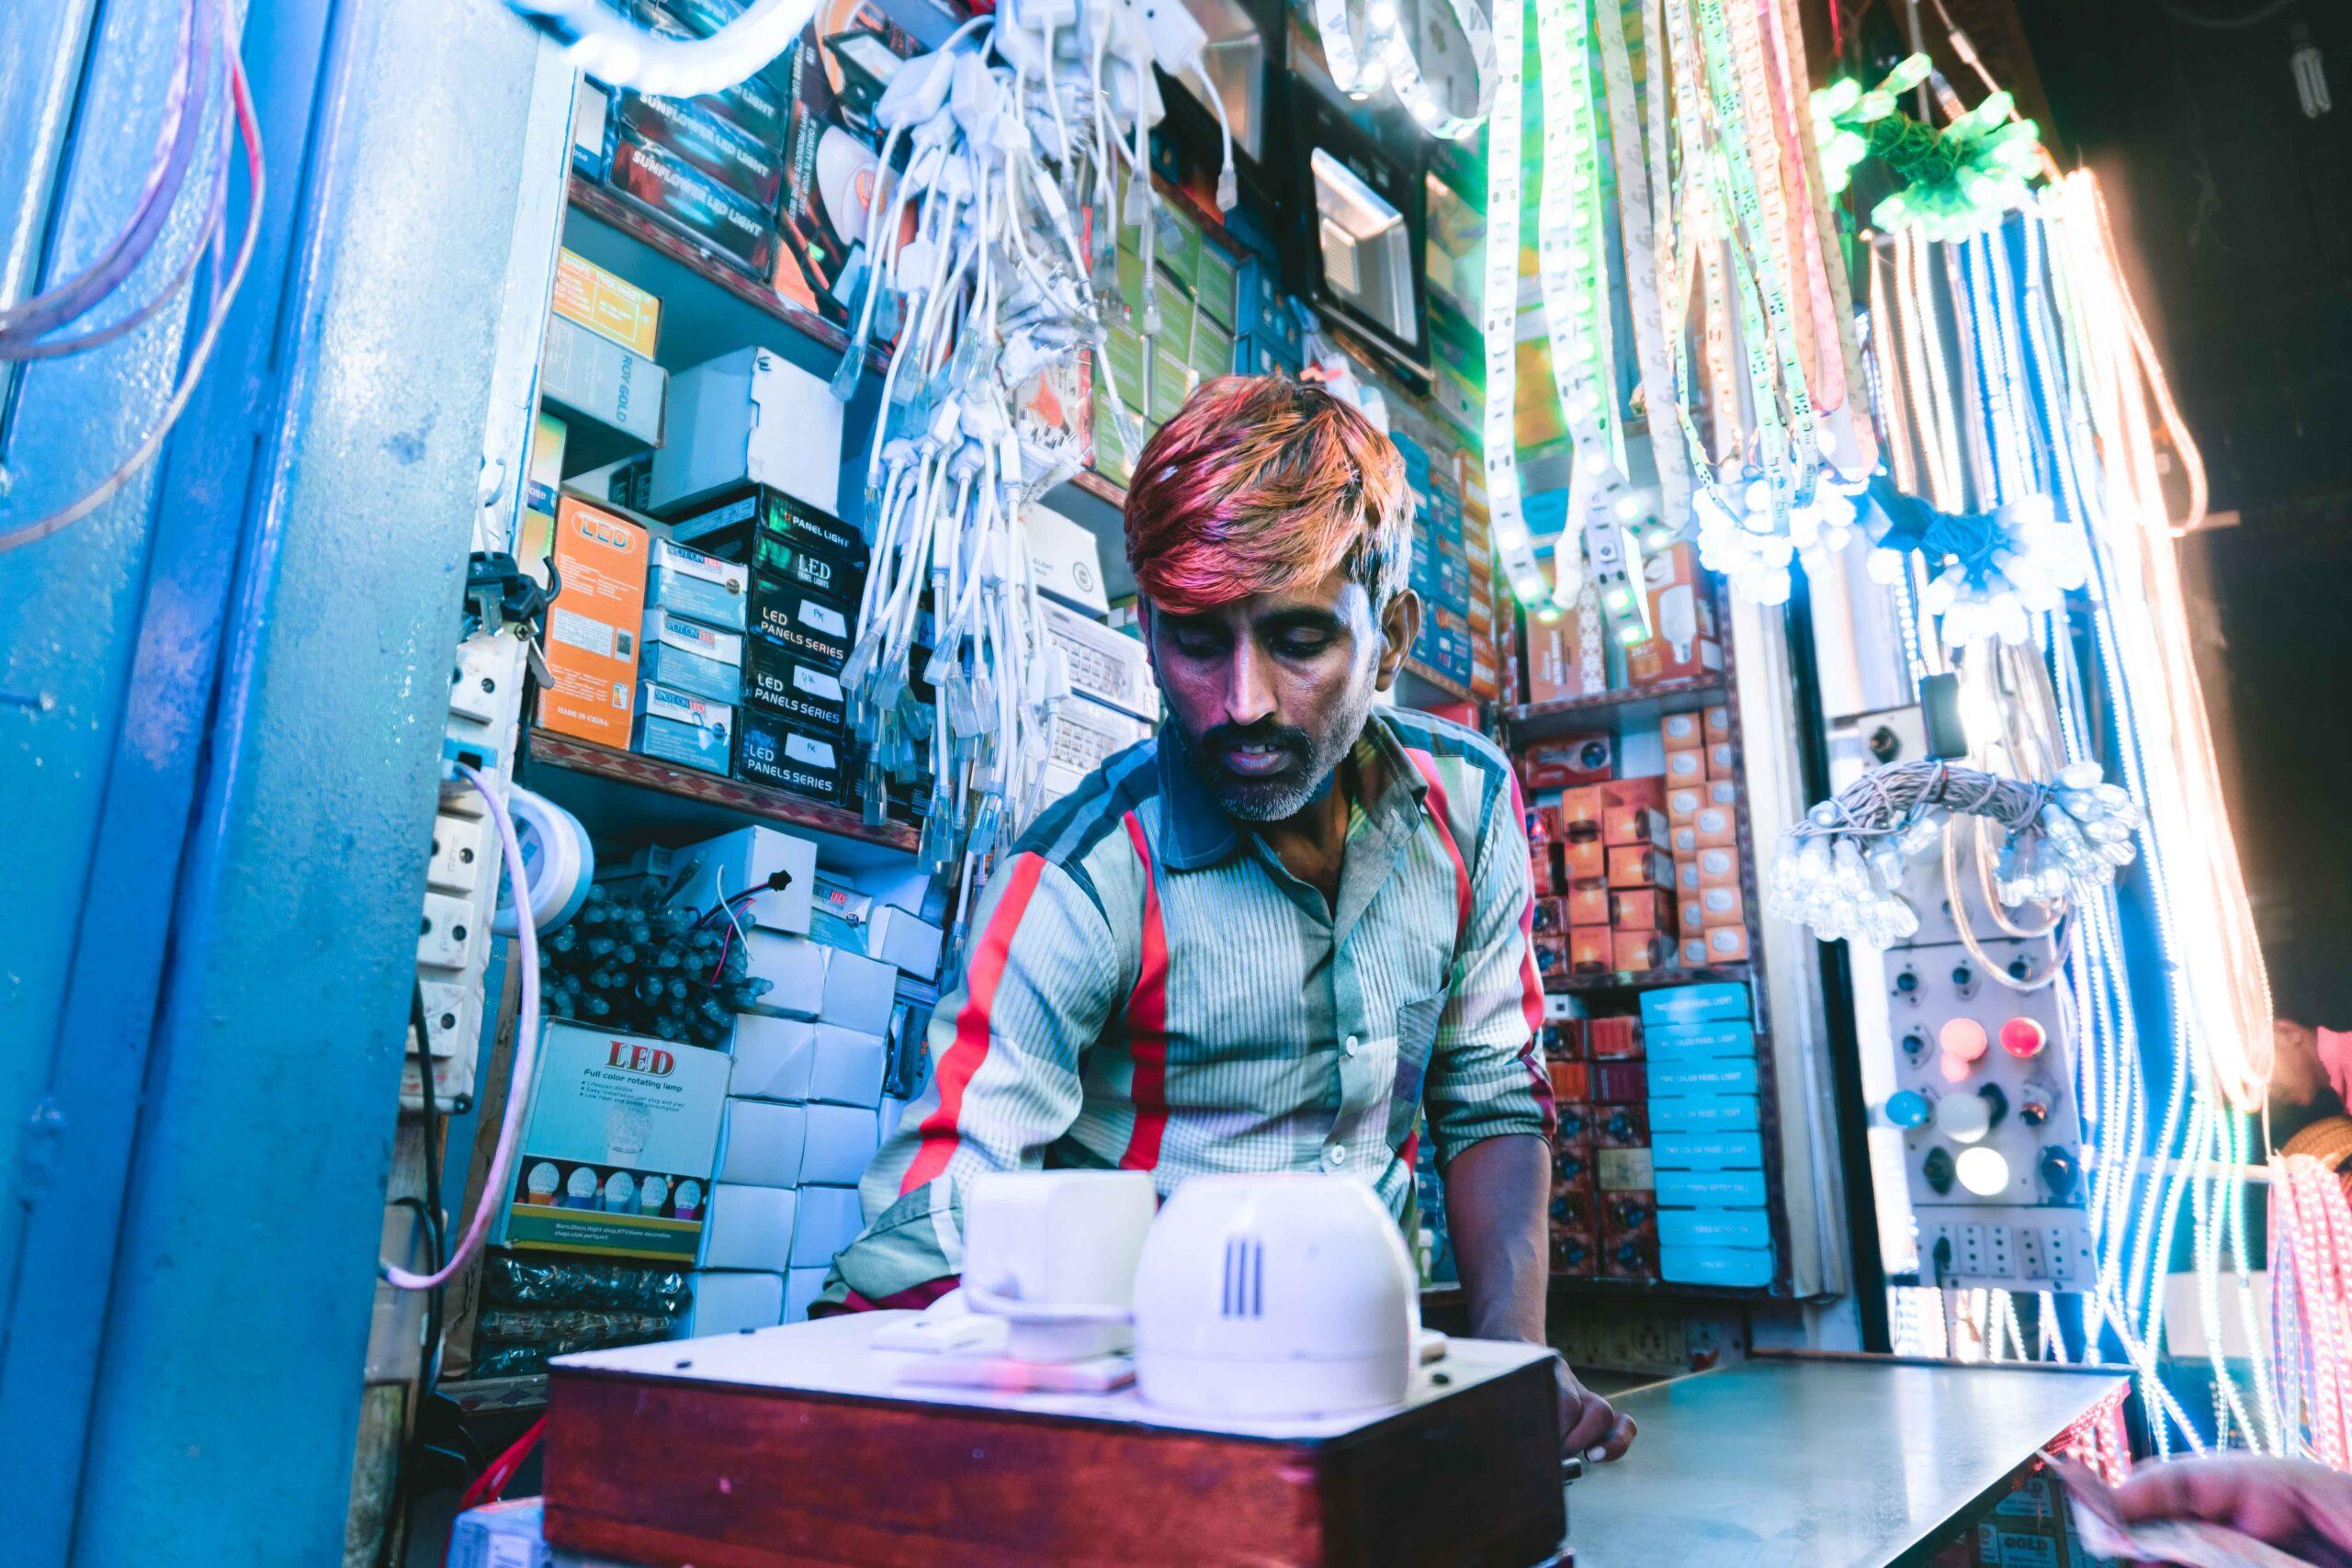 Man running a small electronics shop